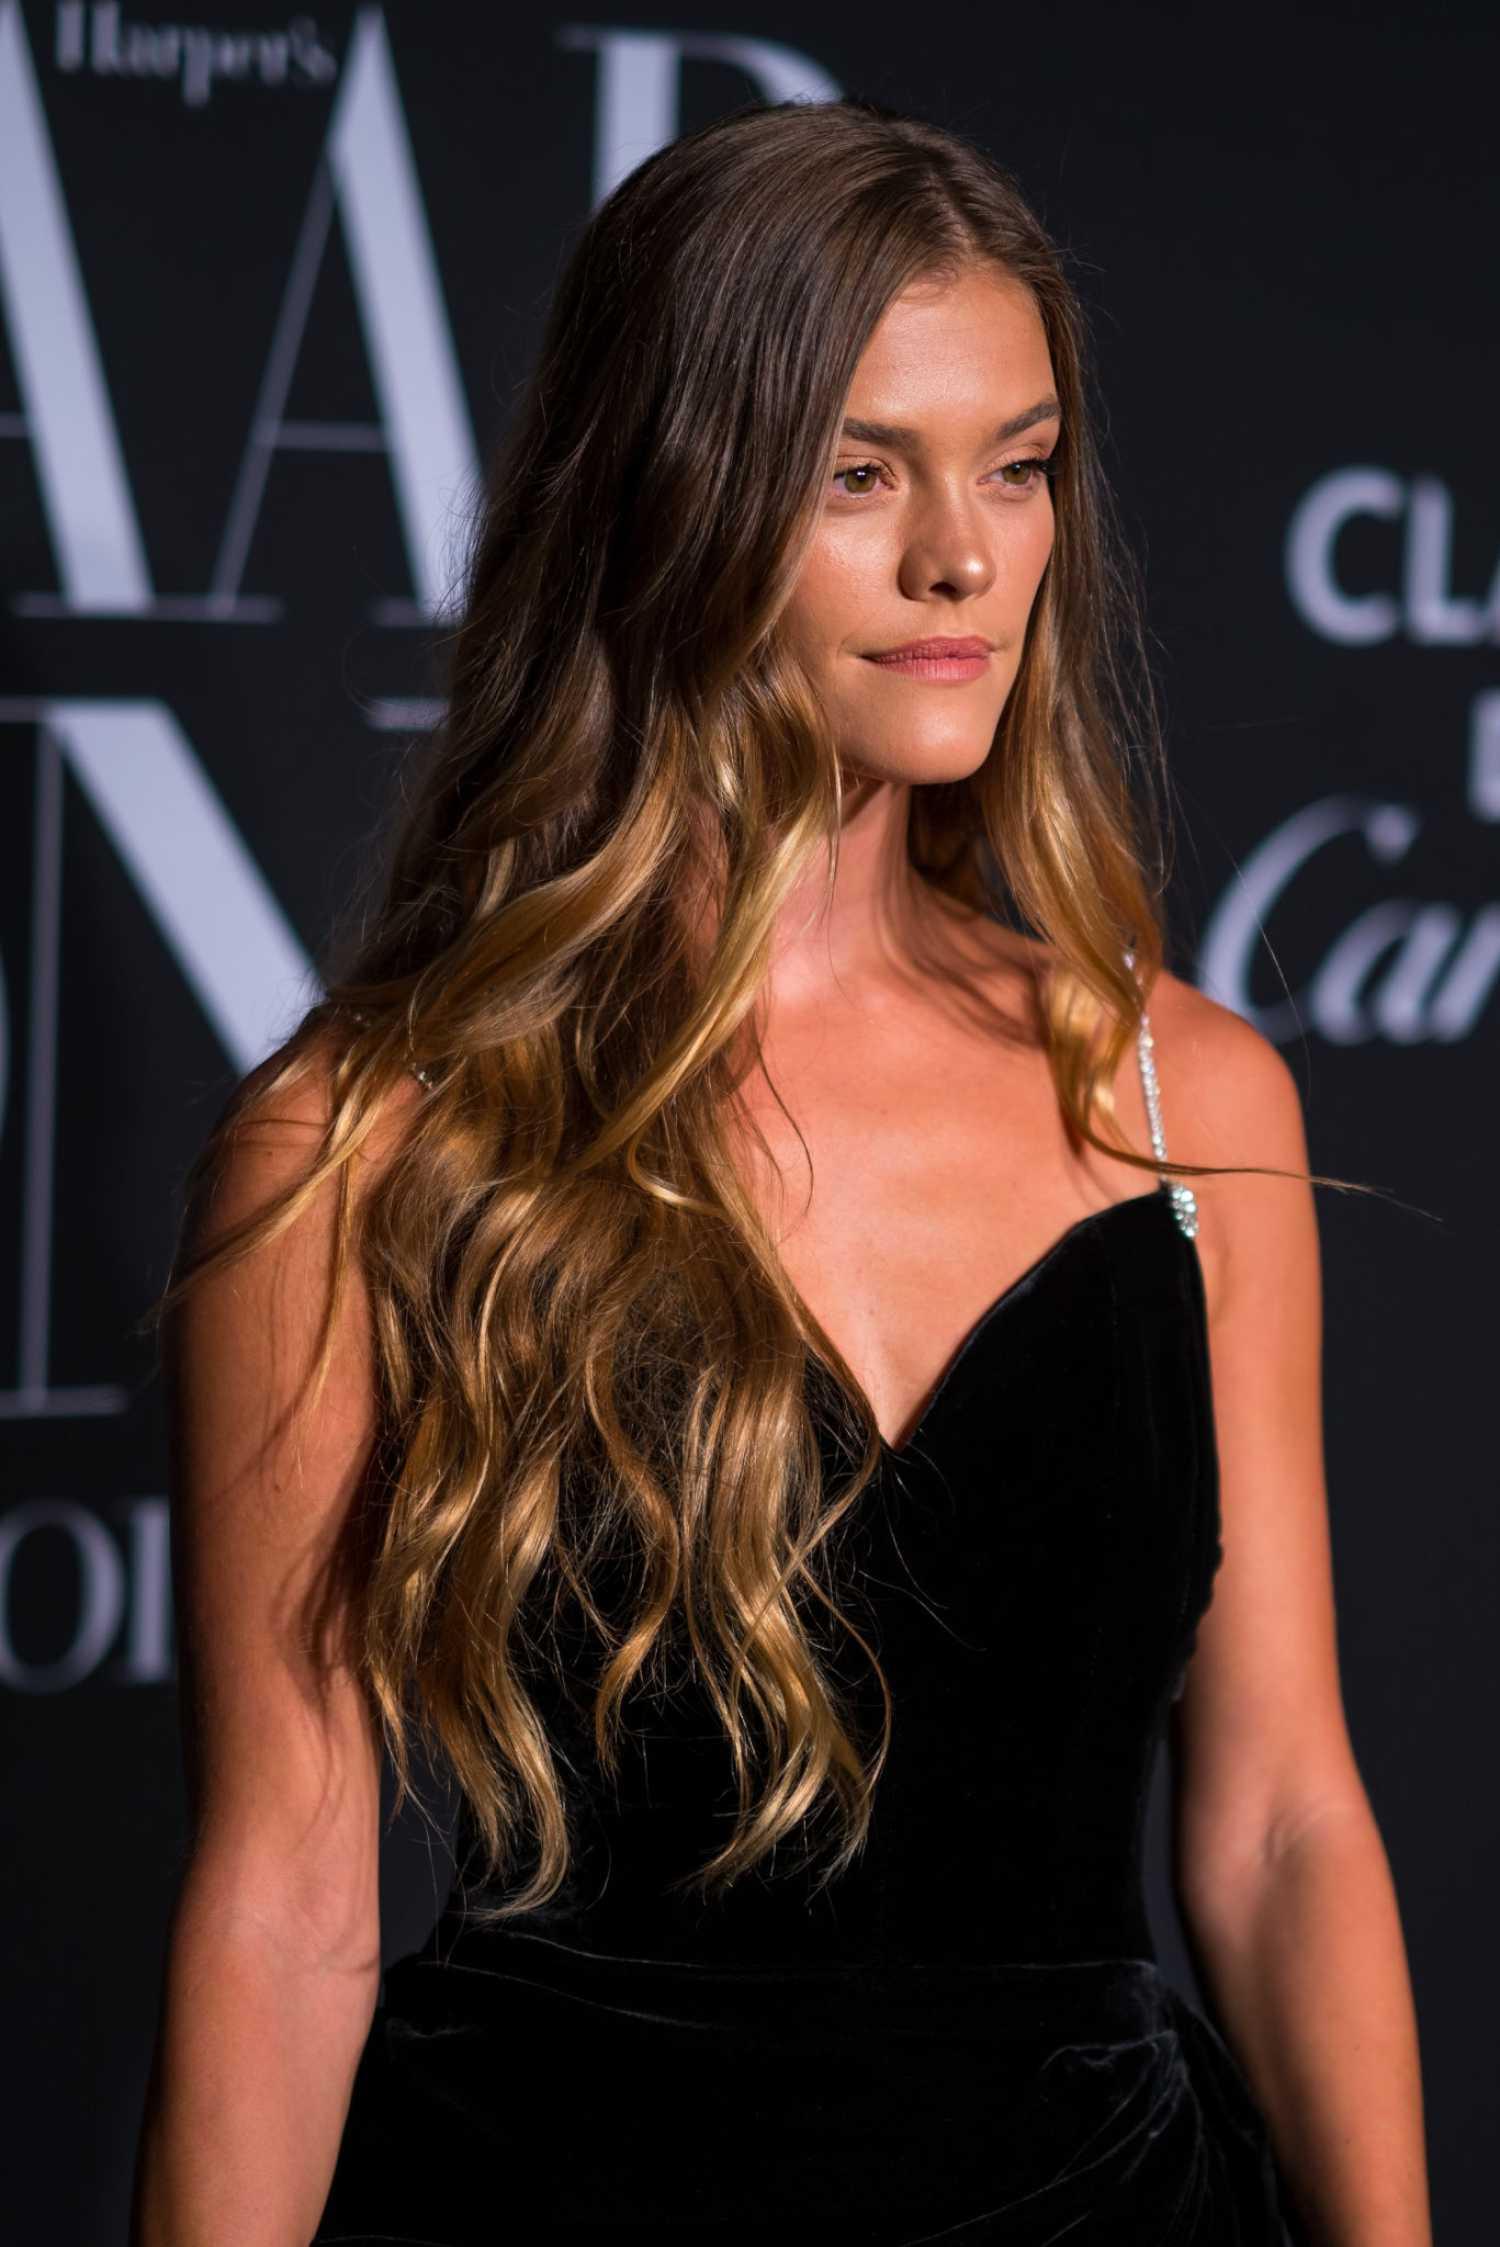 New Photos of Nina Agdal Hot And Sexy (22 Photos) | #The